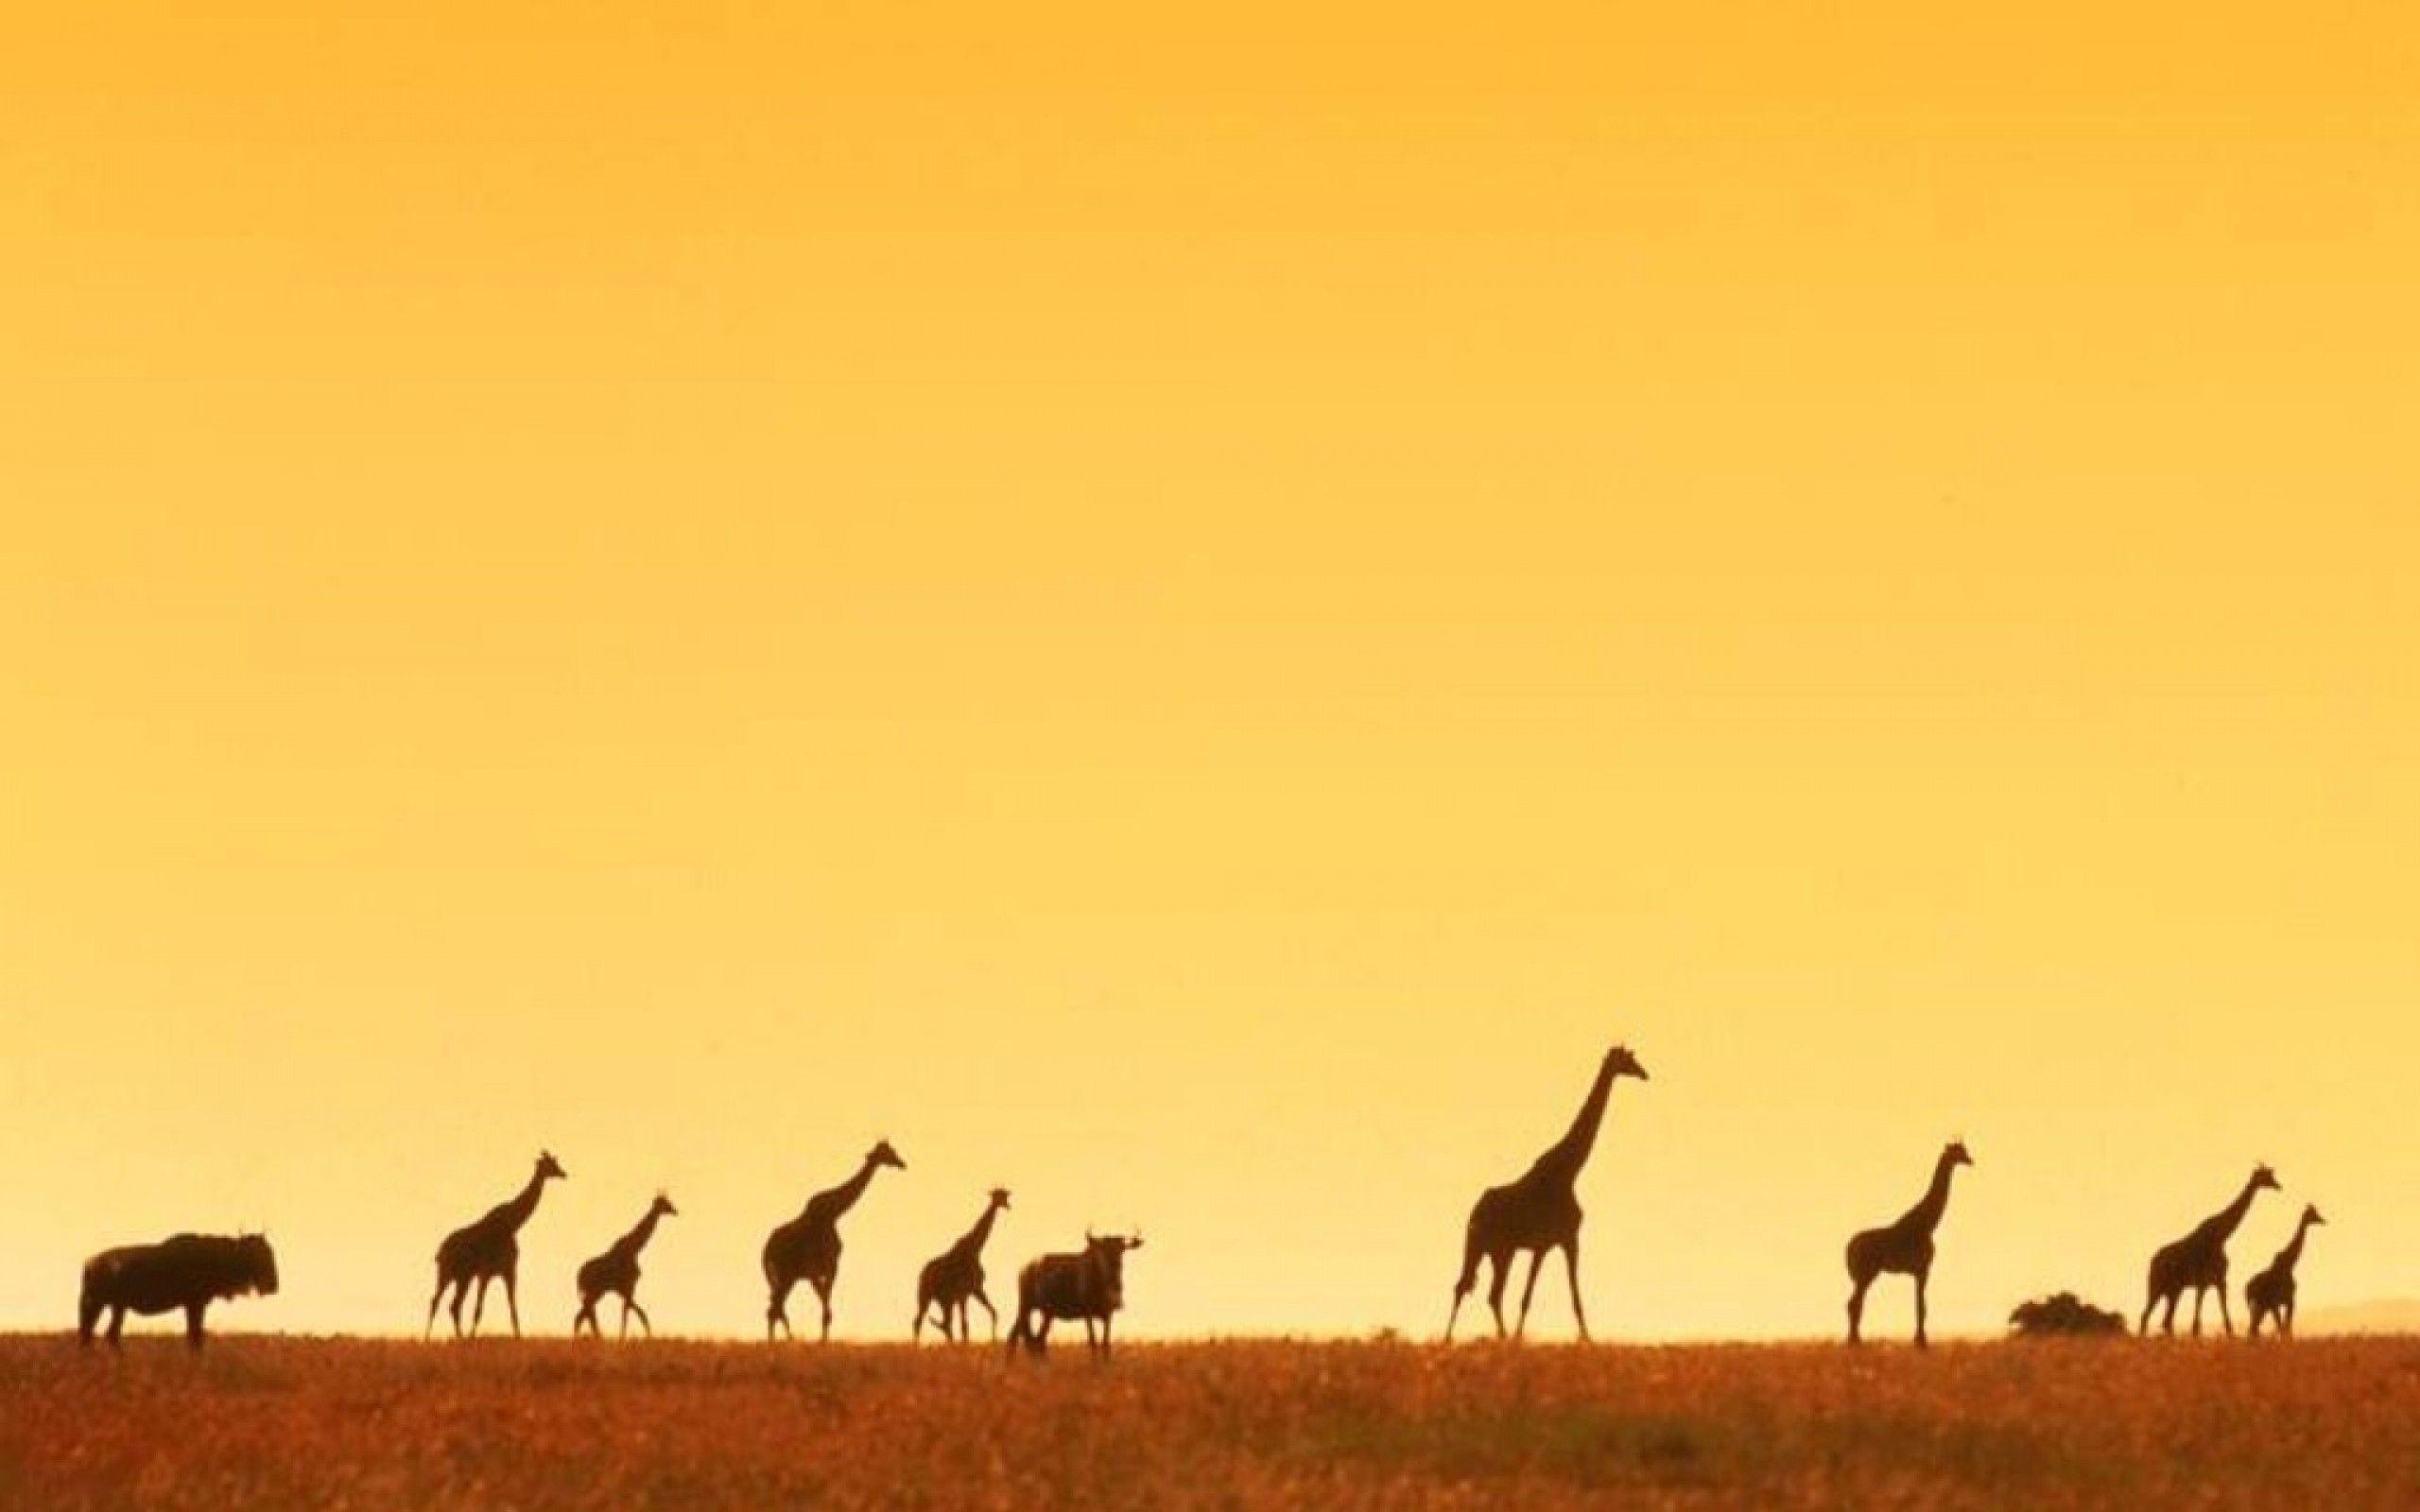 Giraffe Sunset Wallpaper Background with High Definition Wallpaper  Resolution px 126.57 KB Animal Sunset Cute